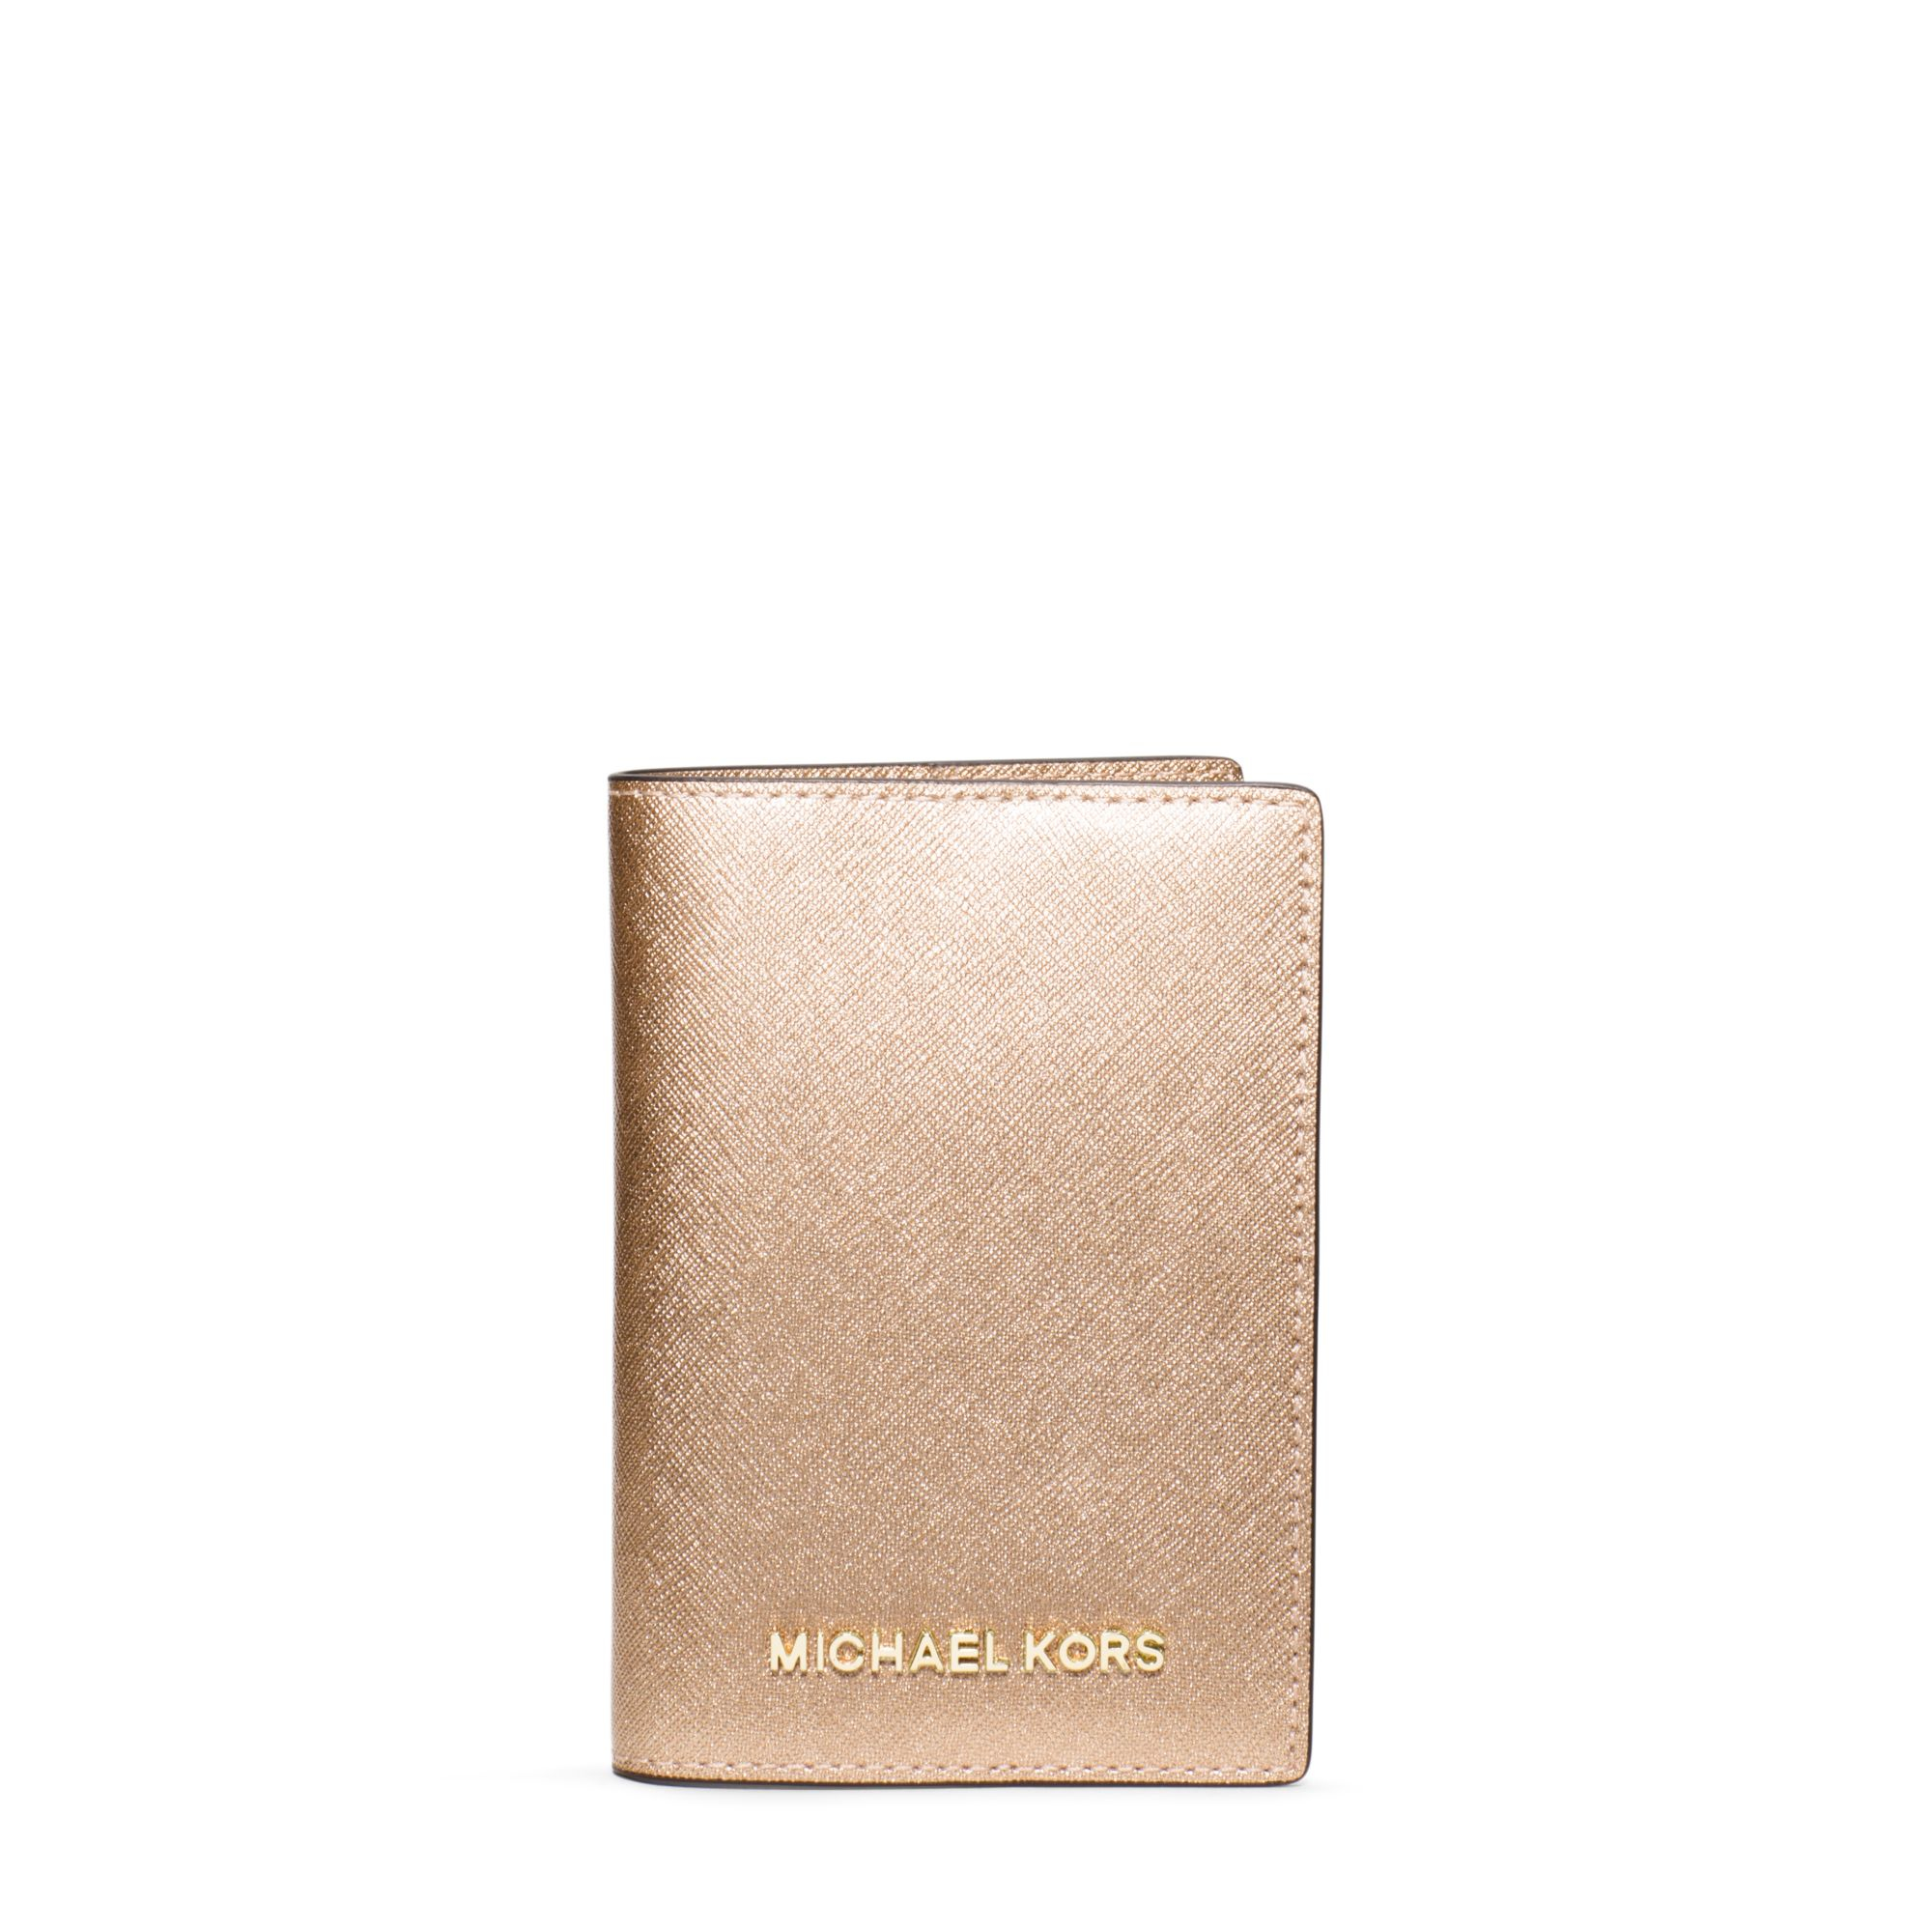 Michael Kors Tassen Gold : Michael kors jet set travel metallic saffiano leather